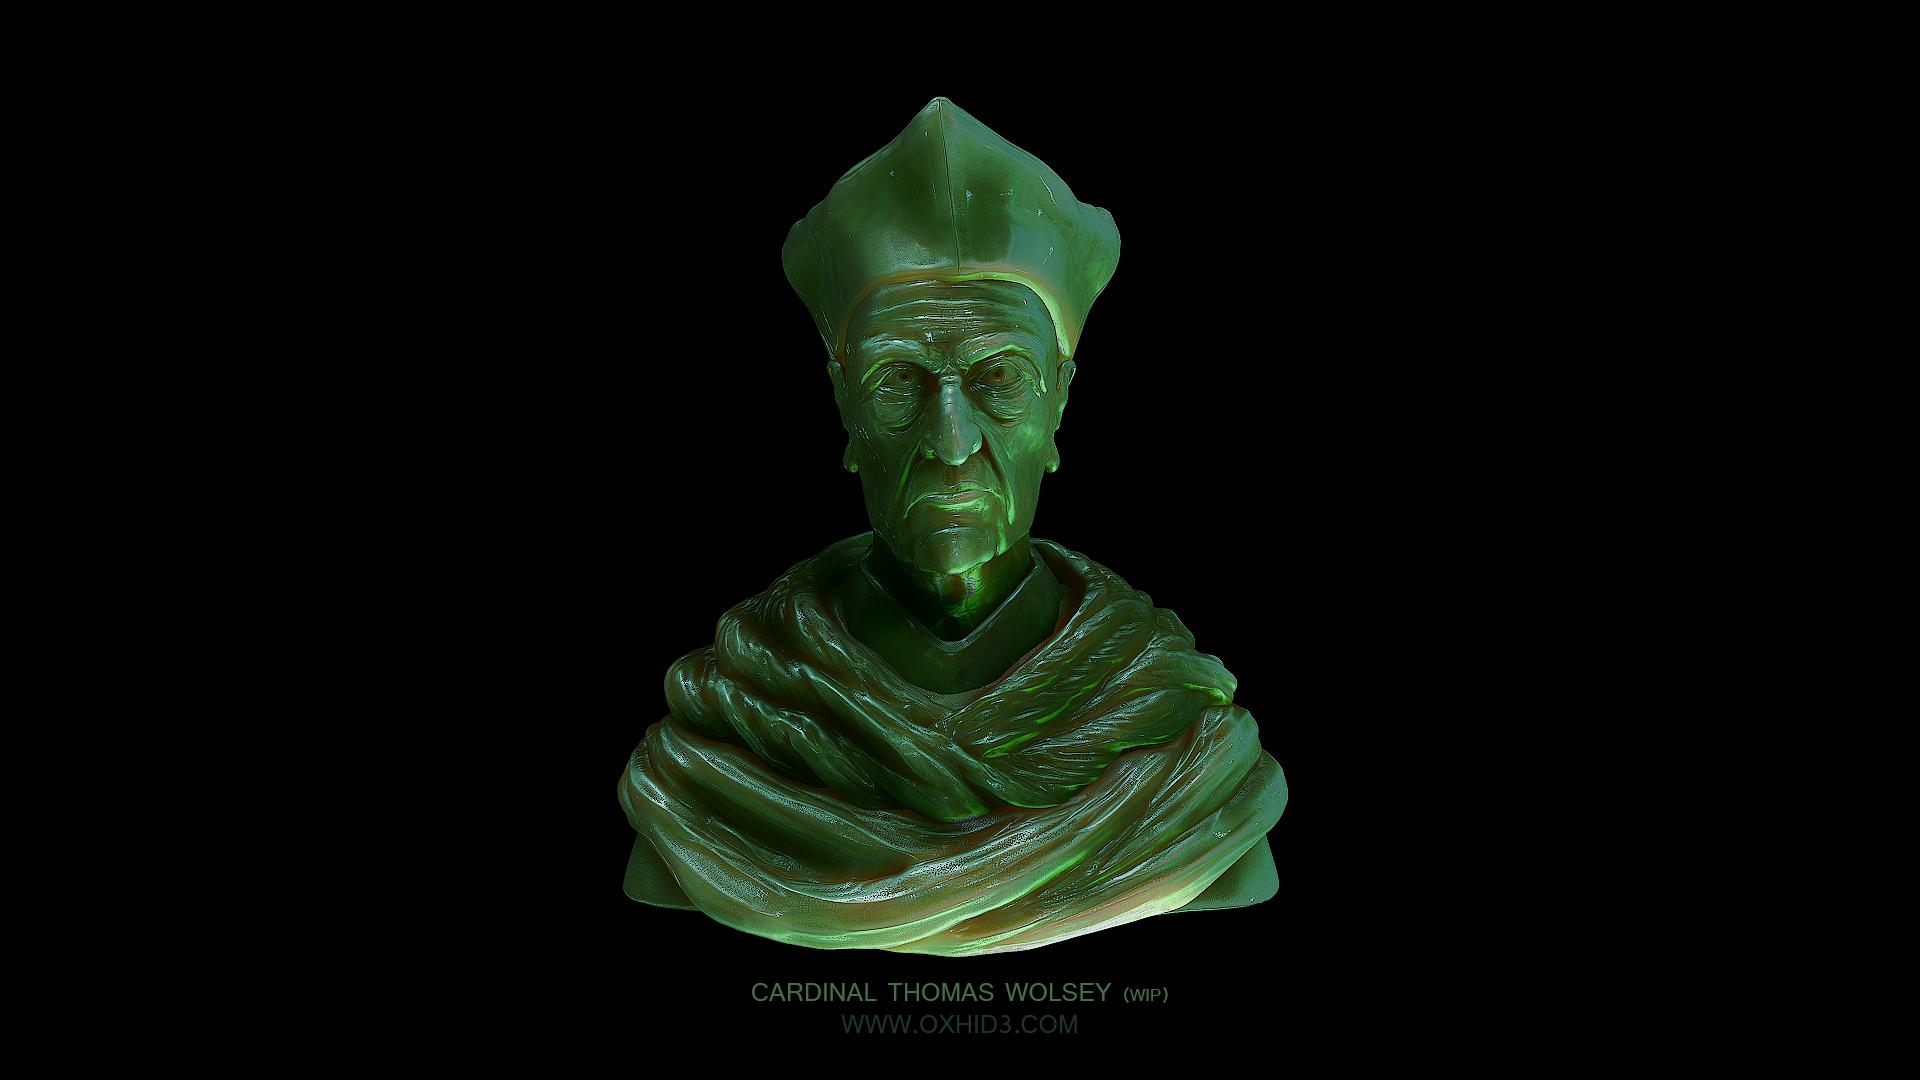 Cardinal Thomas_Wolsey